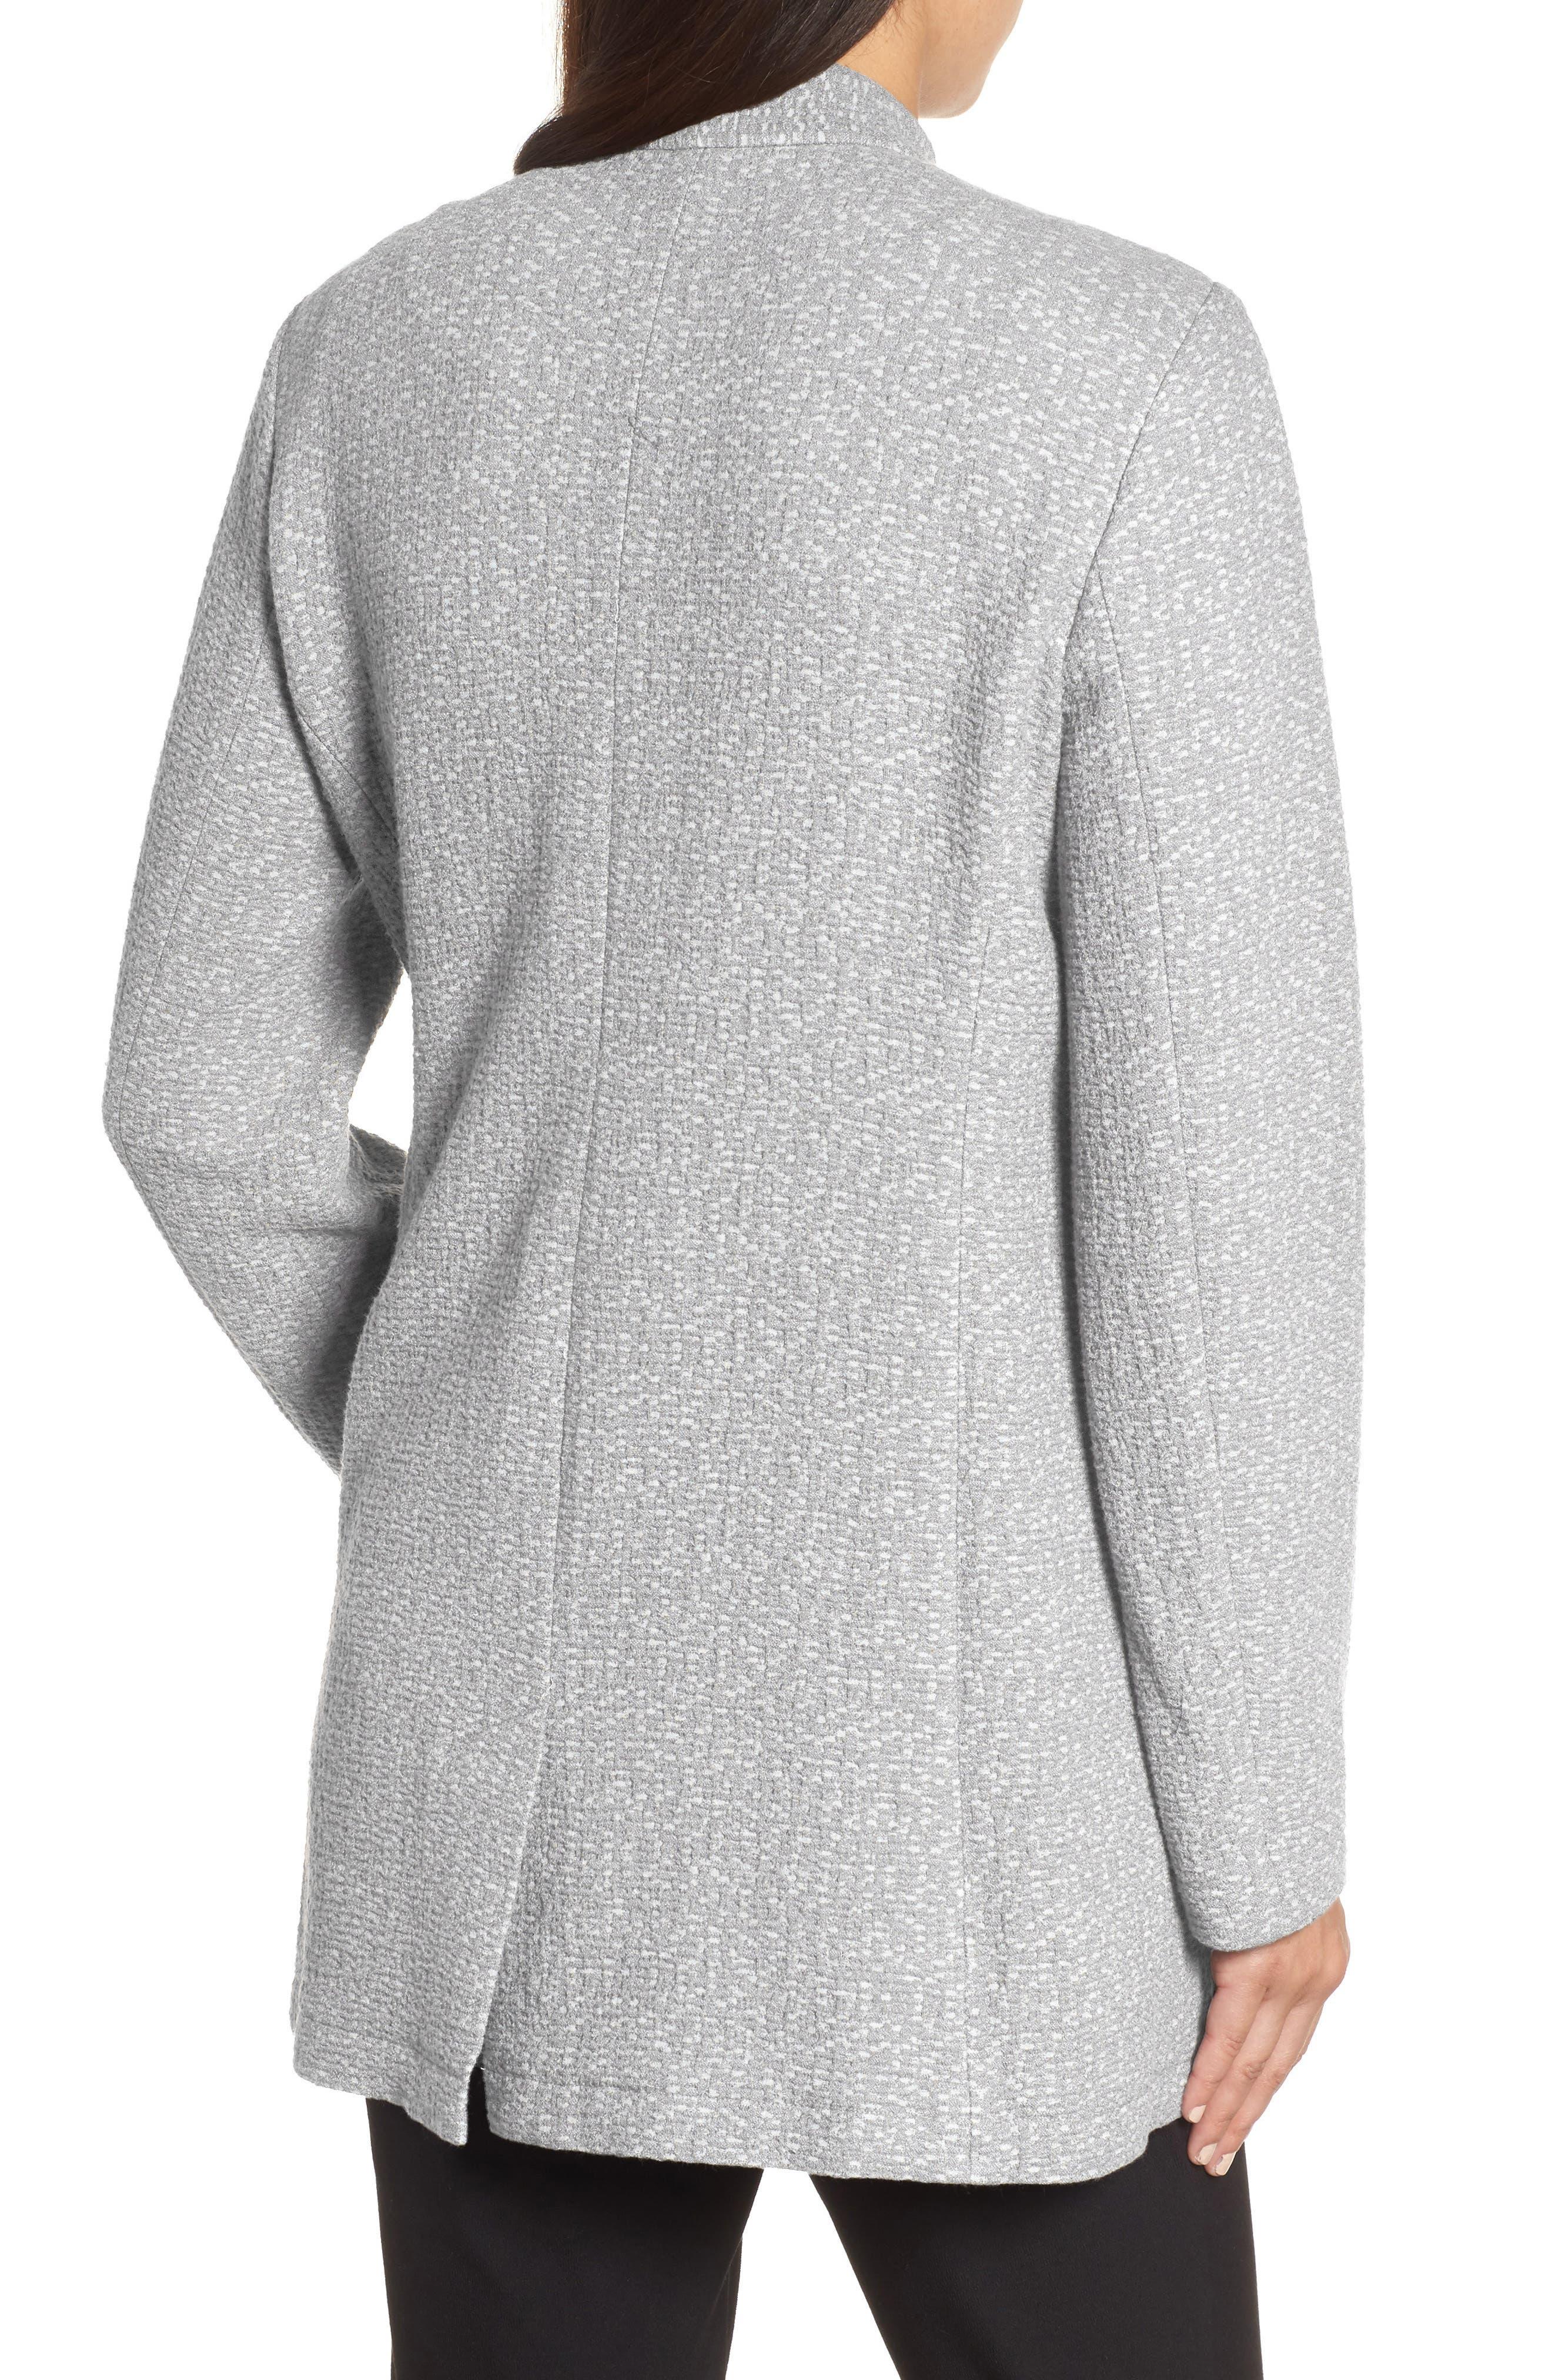 Tweed Jacket,                             Alternate thumbnail 2, color,                             022